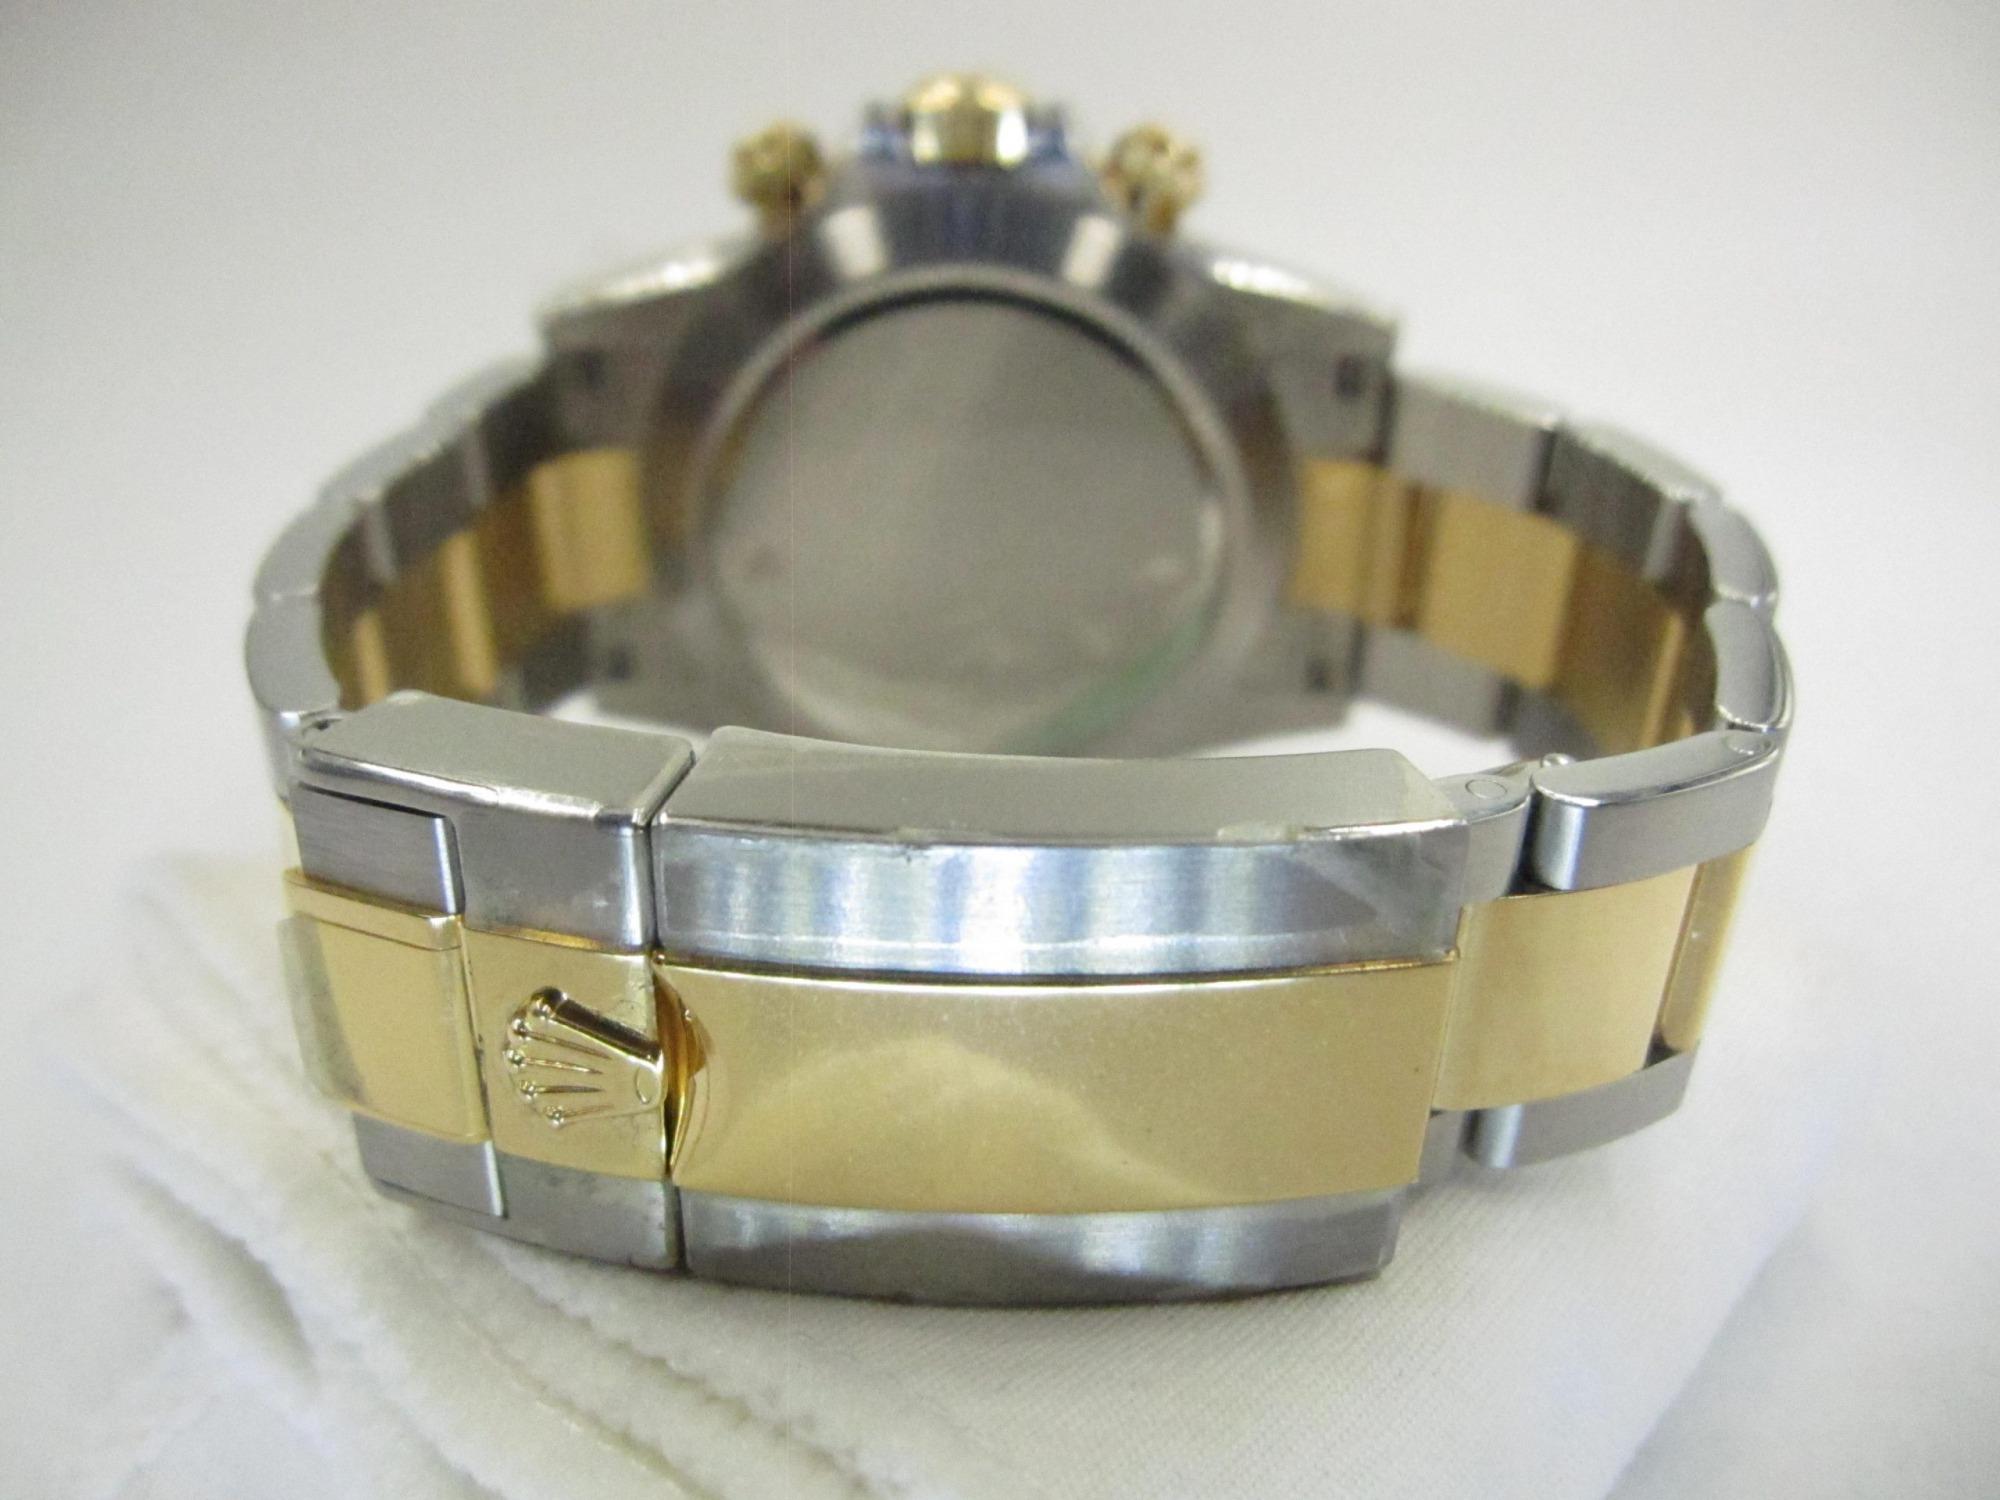 Rolex Daytona Cosmograph 116523 Panda Dial (Pre-Owned Rolex Watch) RL-368